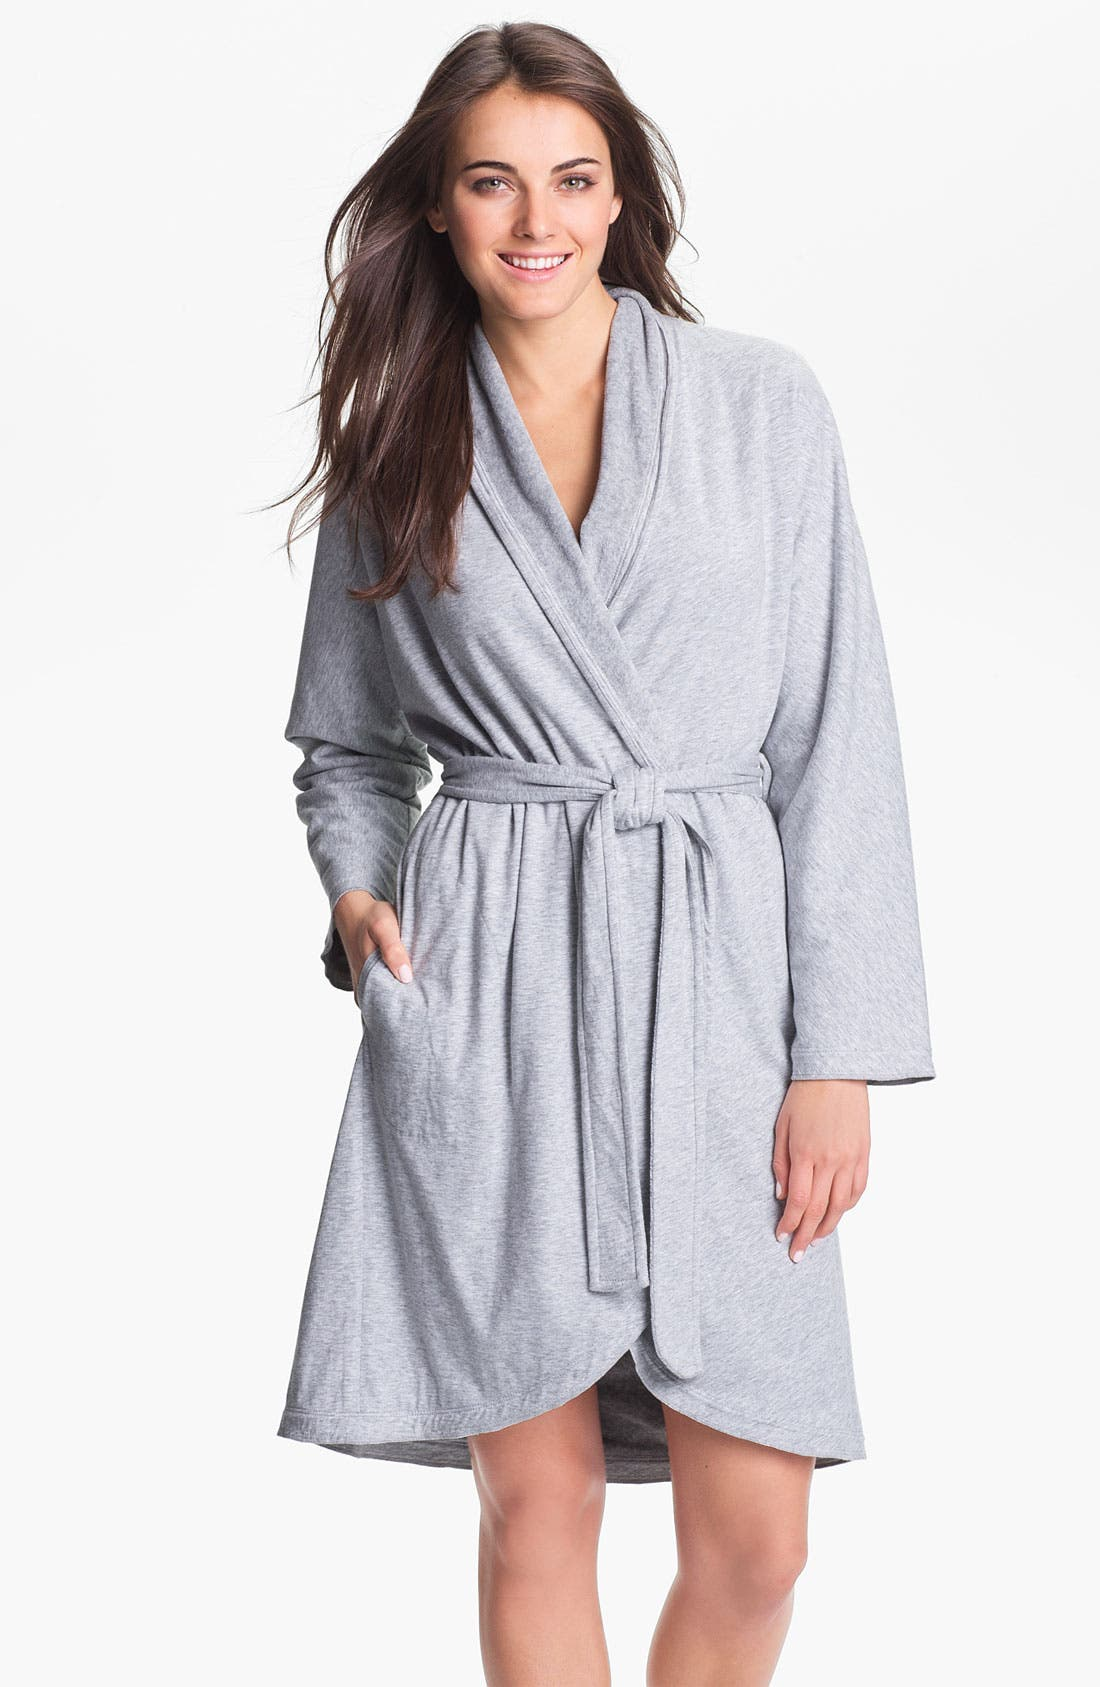 Donna Karan 'Casual Luxe' Robe,                             Main thumbnail 1, color,                             060